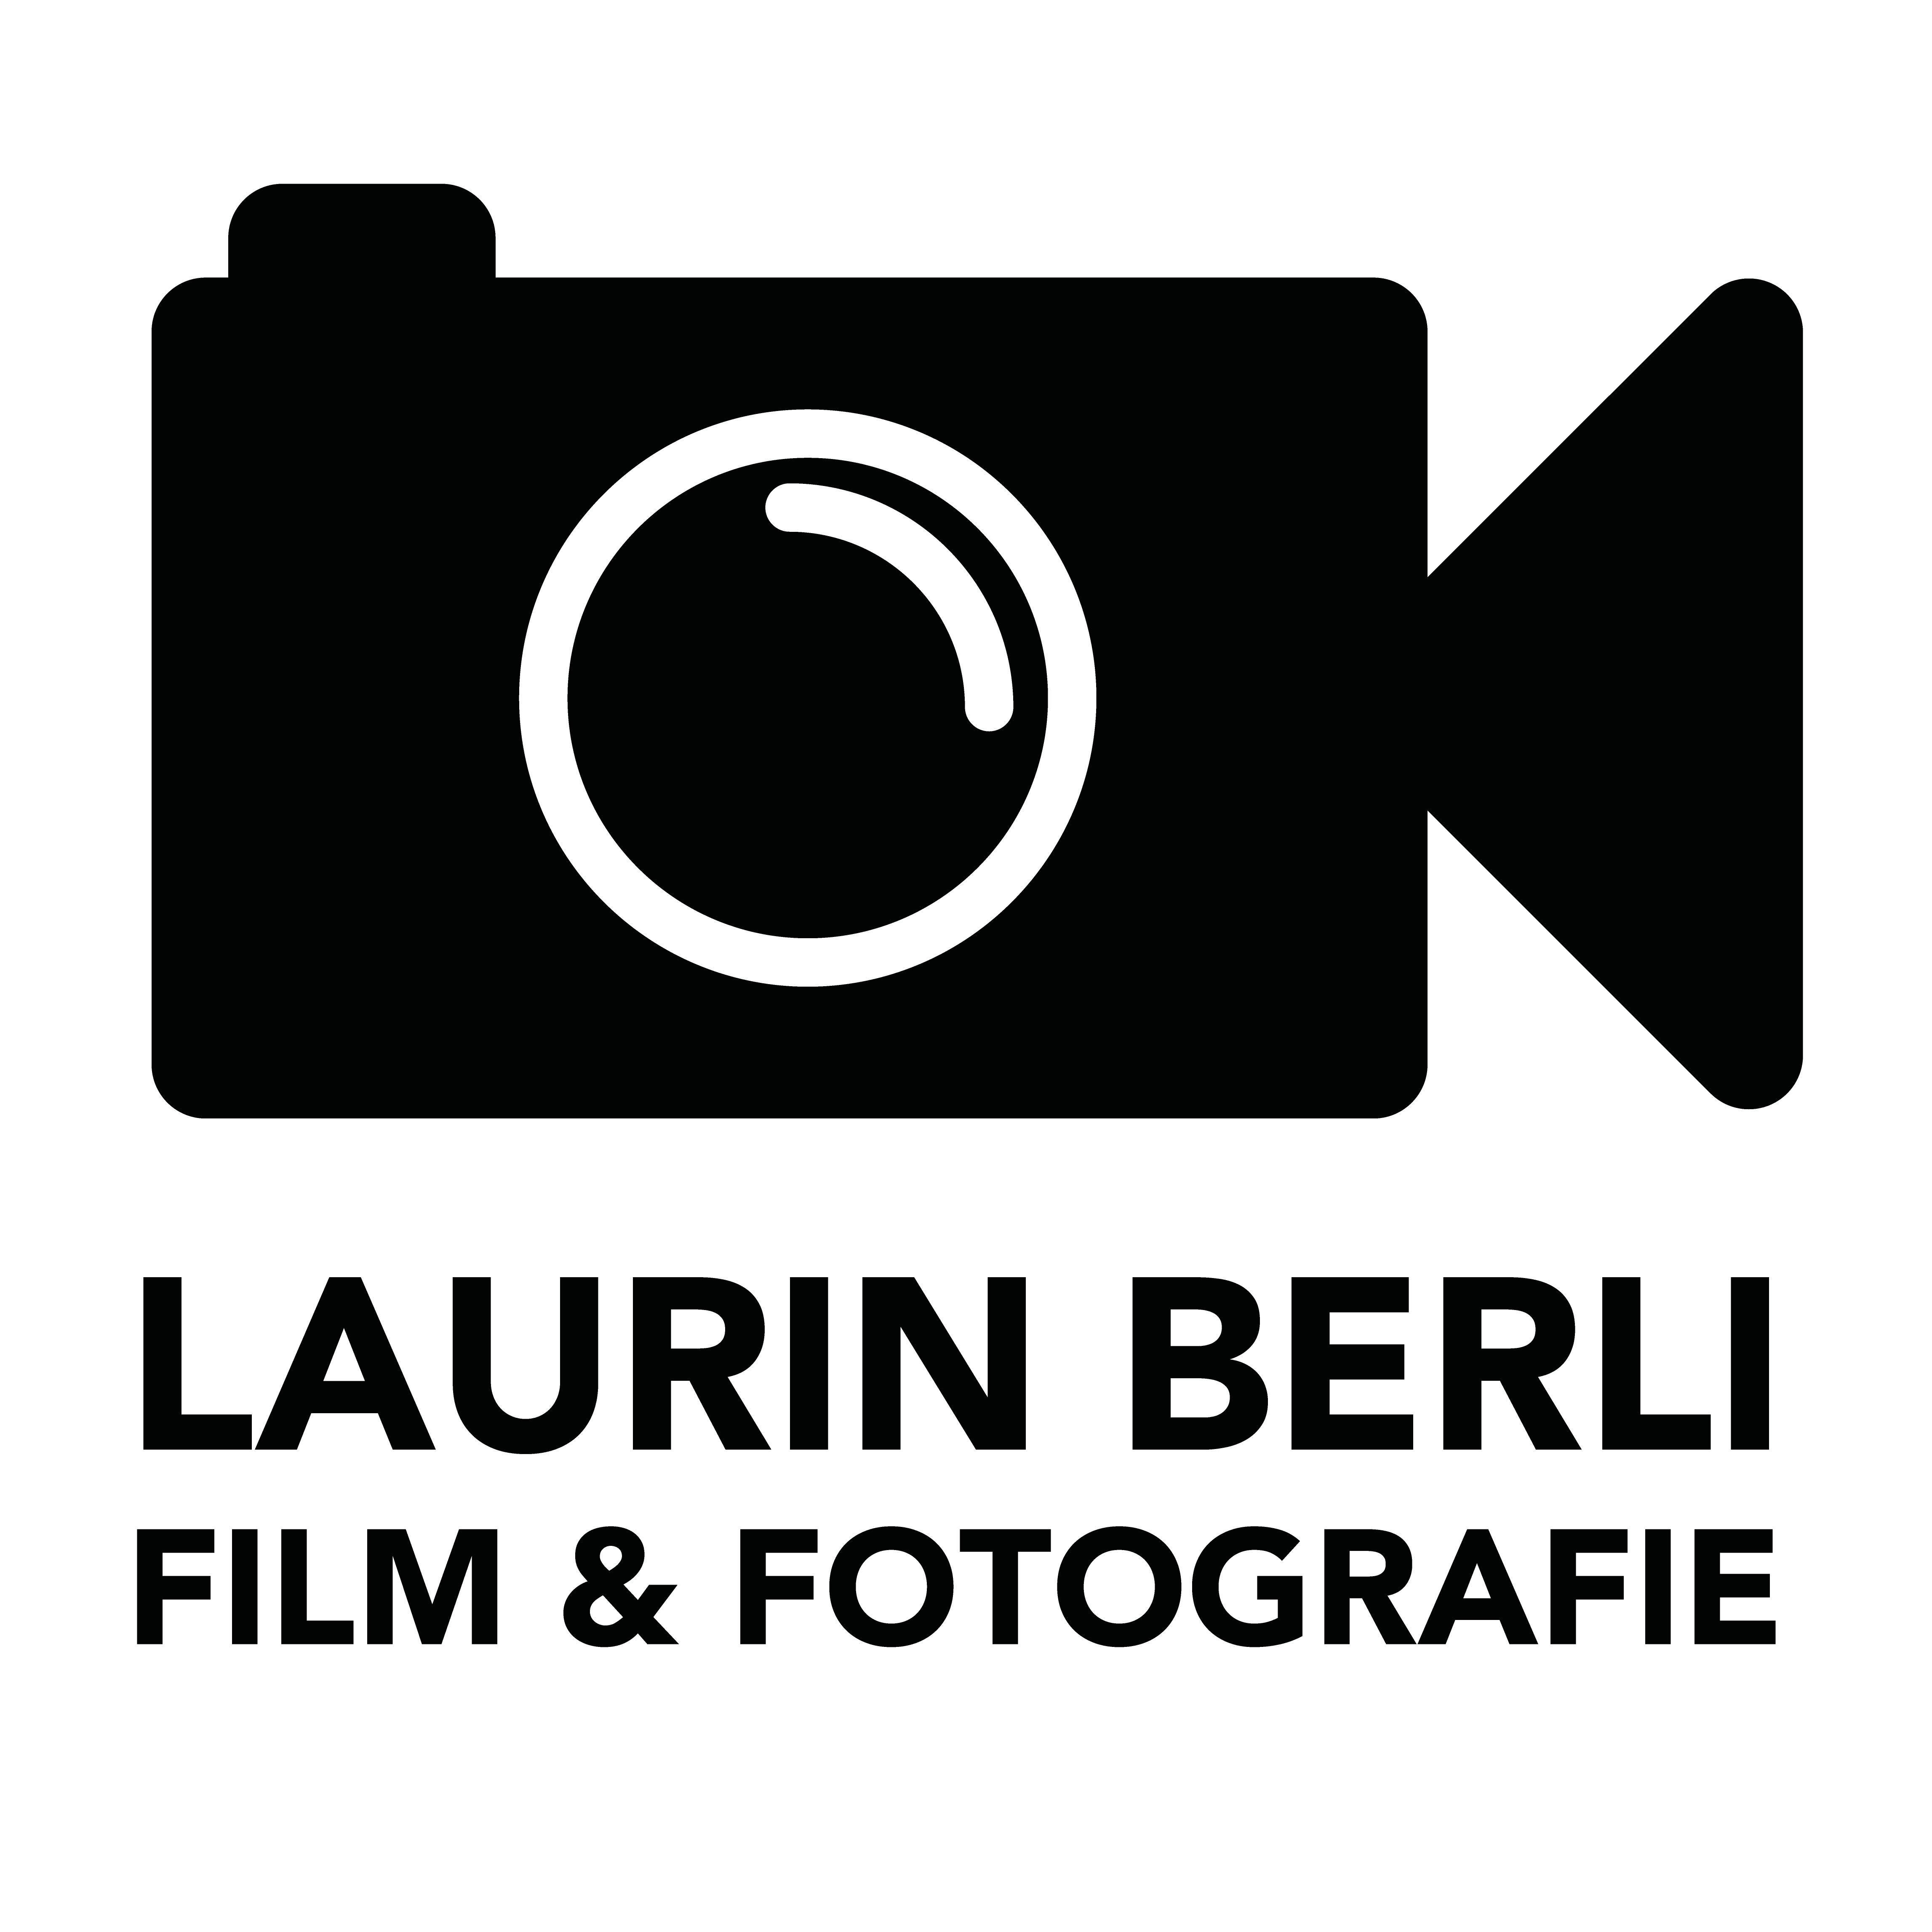 Laurin Berli Film & Fotografie